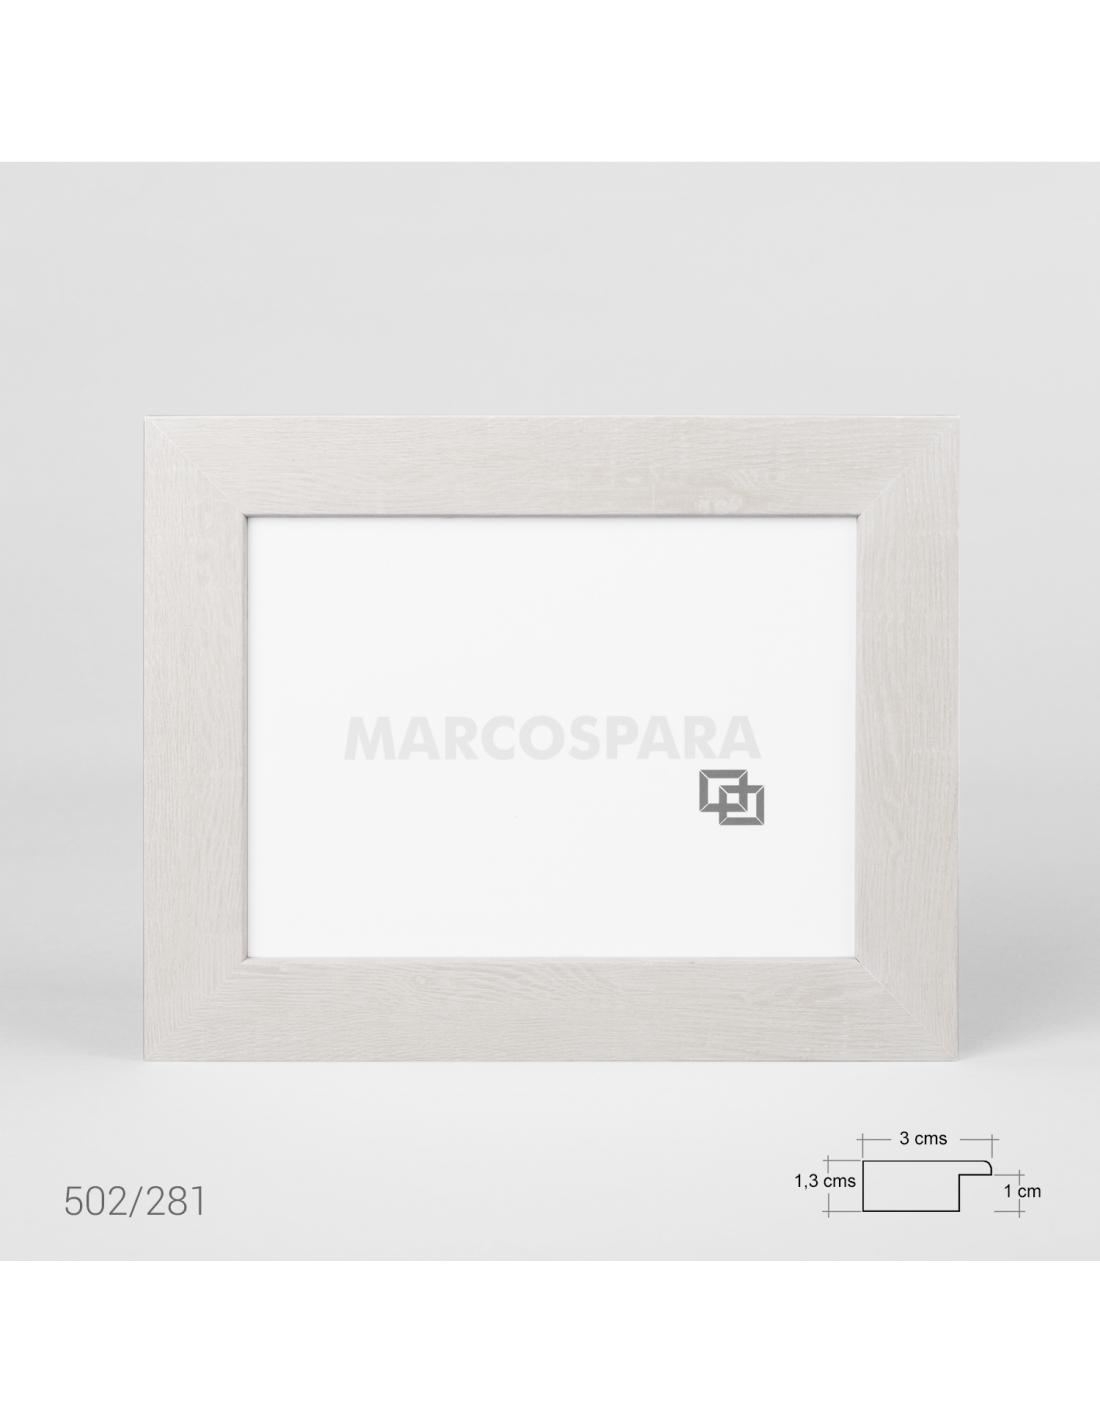 Marcos de madera para posters M502